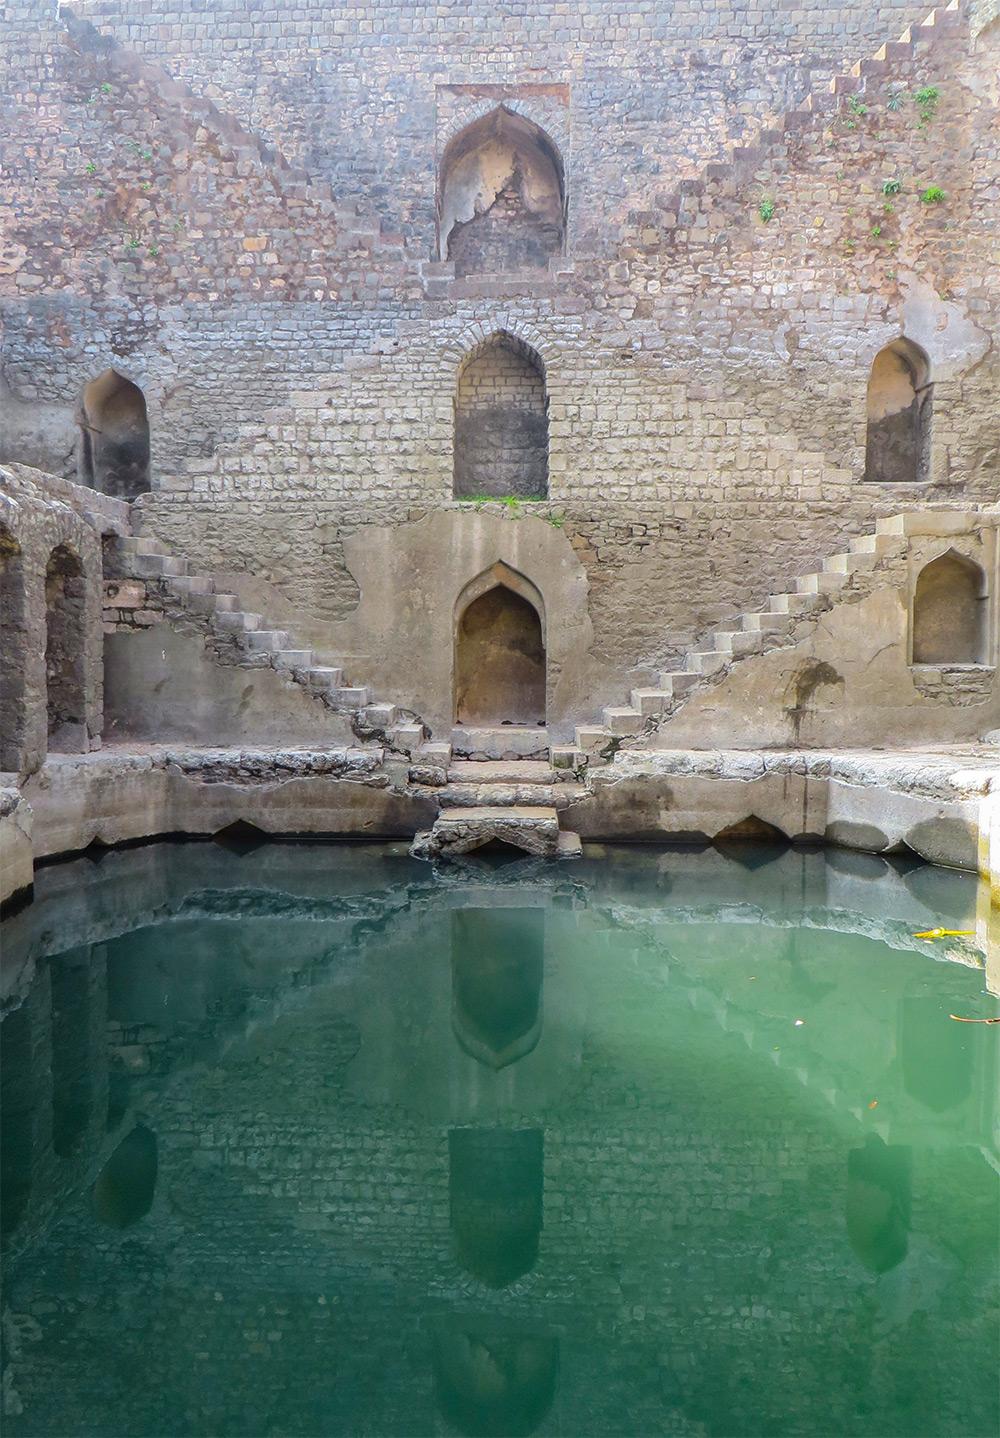 arquitetura-que-esta-desaparecendo-na-india-stepwells-blog-usenatureza